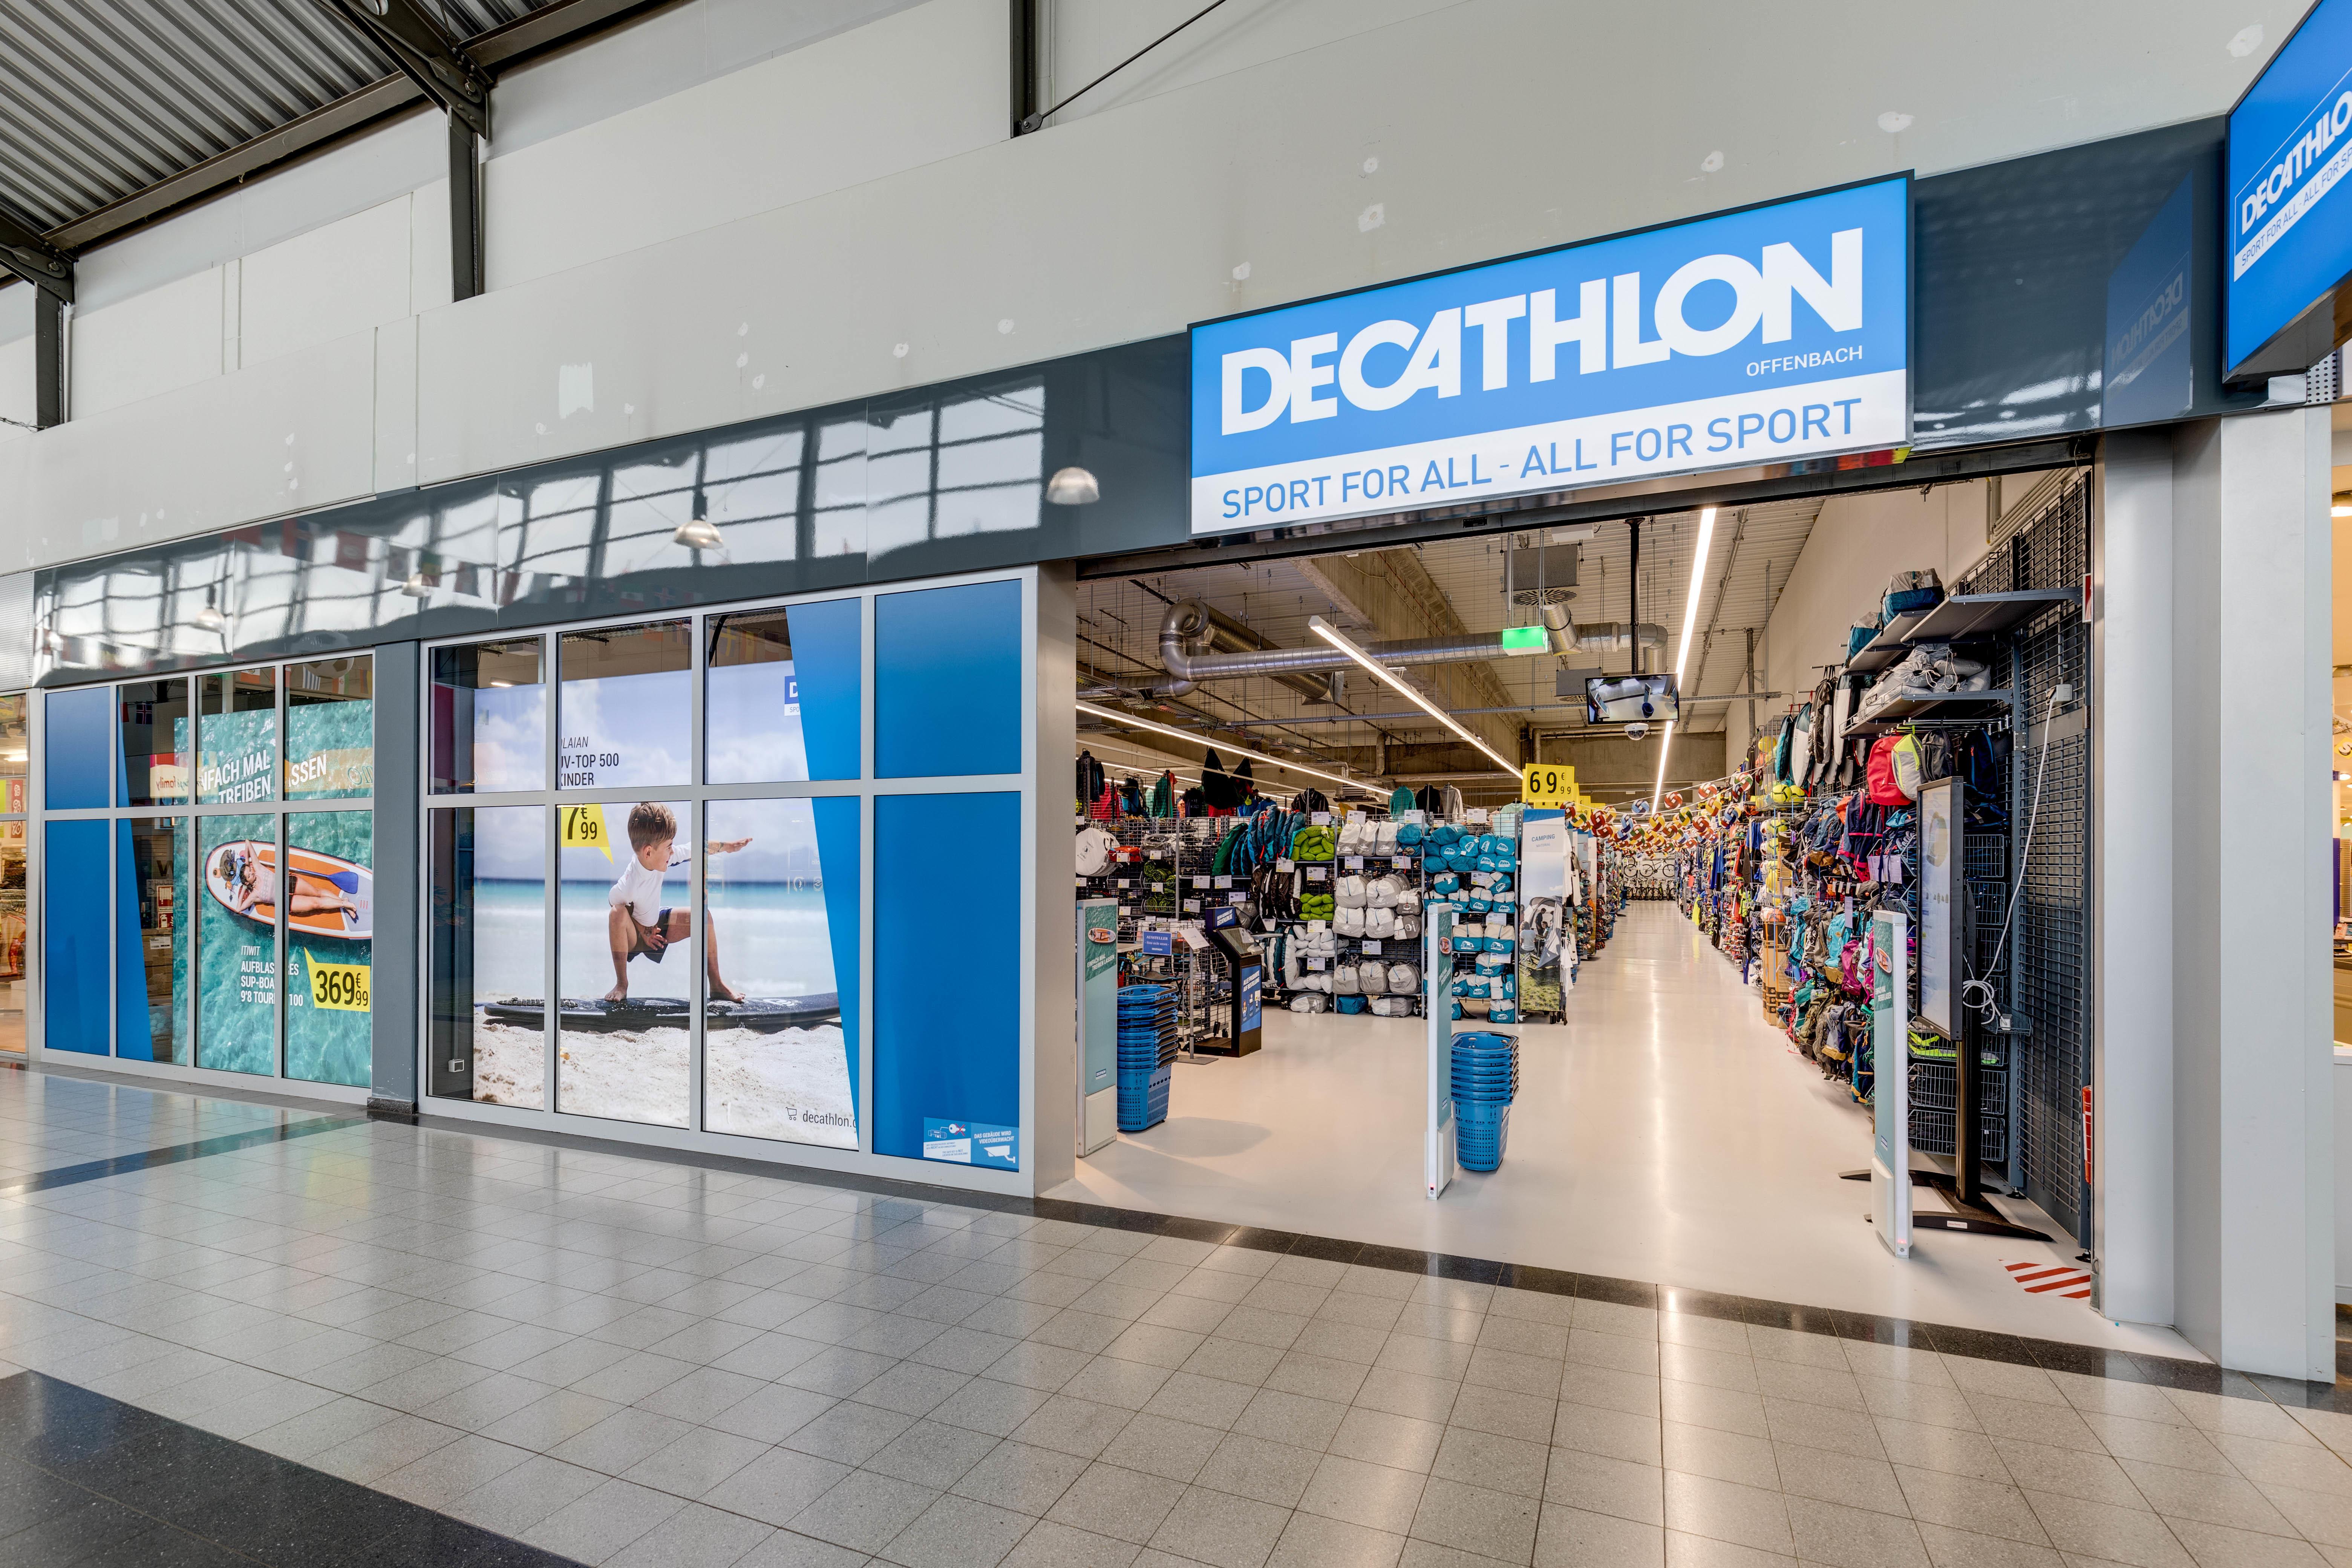 decathlon offenbach direkt im ring center offenbach am main 63069 yellowmap. Black Bedroom Furniture Sets. Home Design Ideas